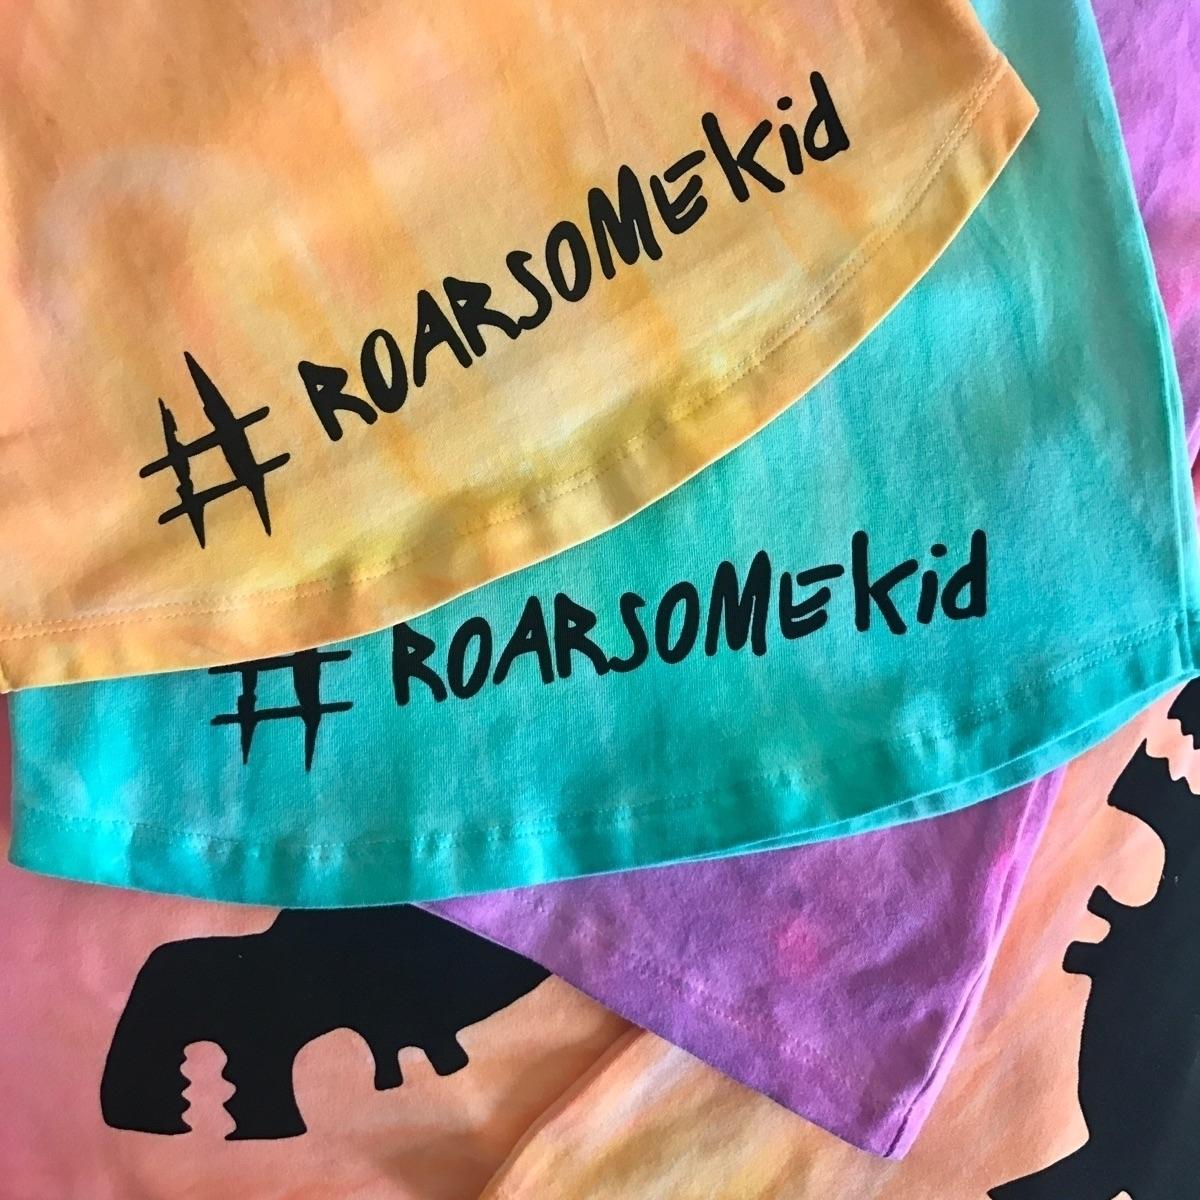 Roarsome Kid (@roarsomekid) Cover Image